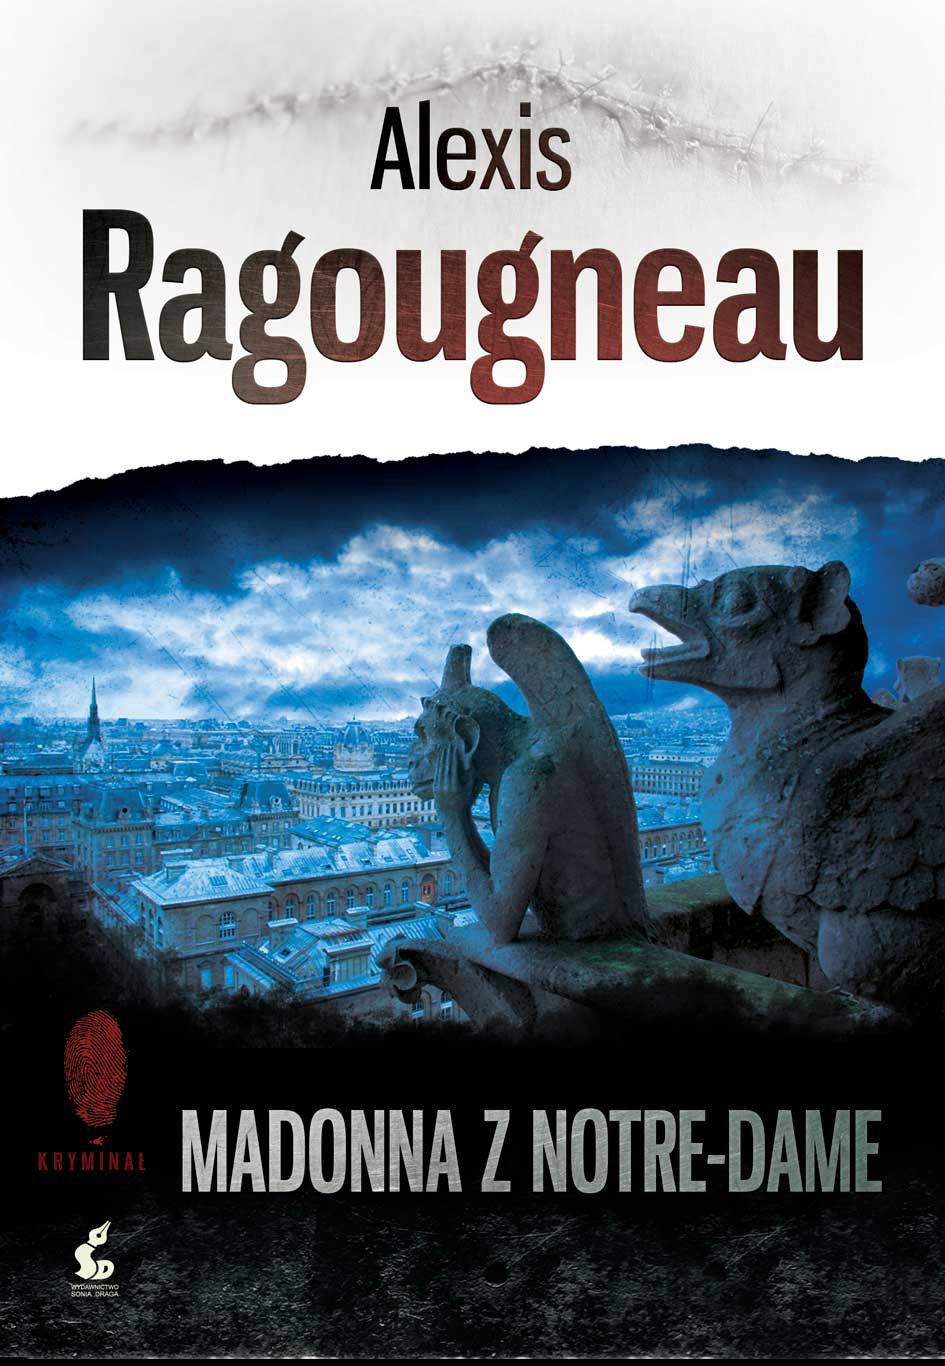 Madonna z Notre-Dame - Ebook (Książka EPUB) do pobrania w formacie EPUB